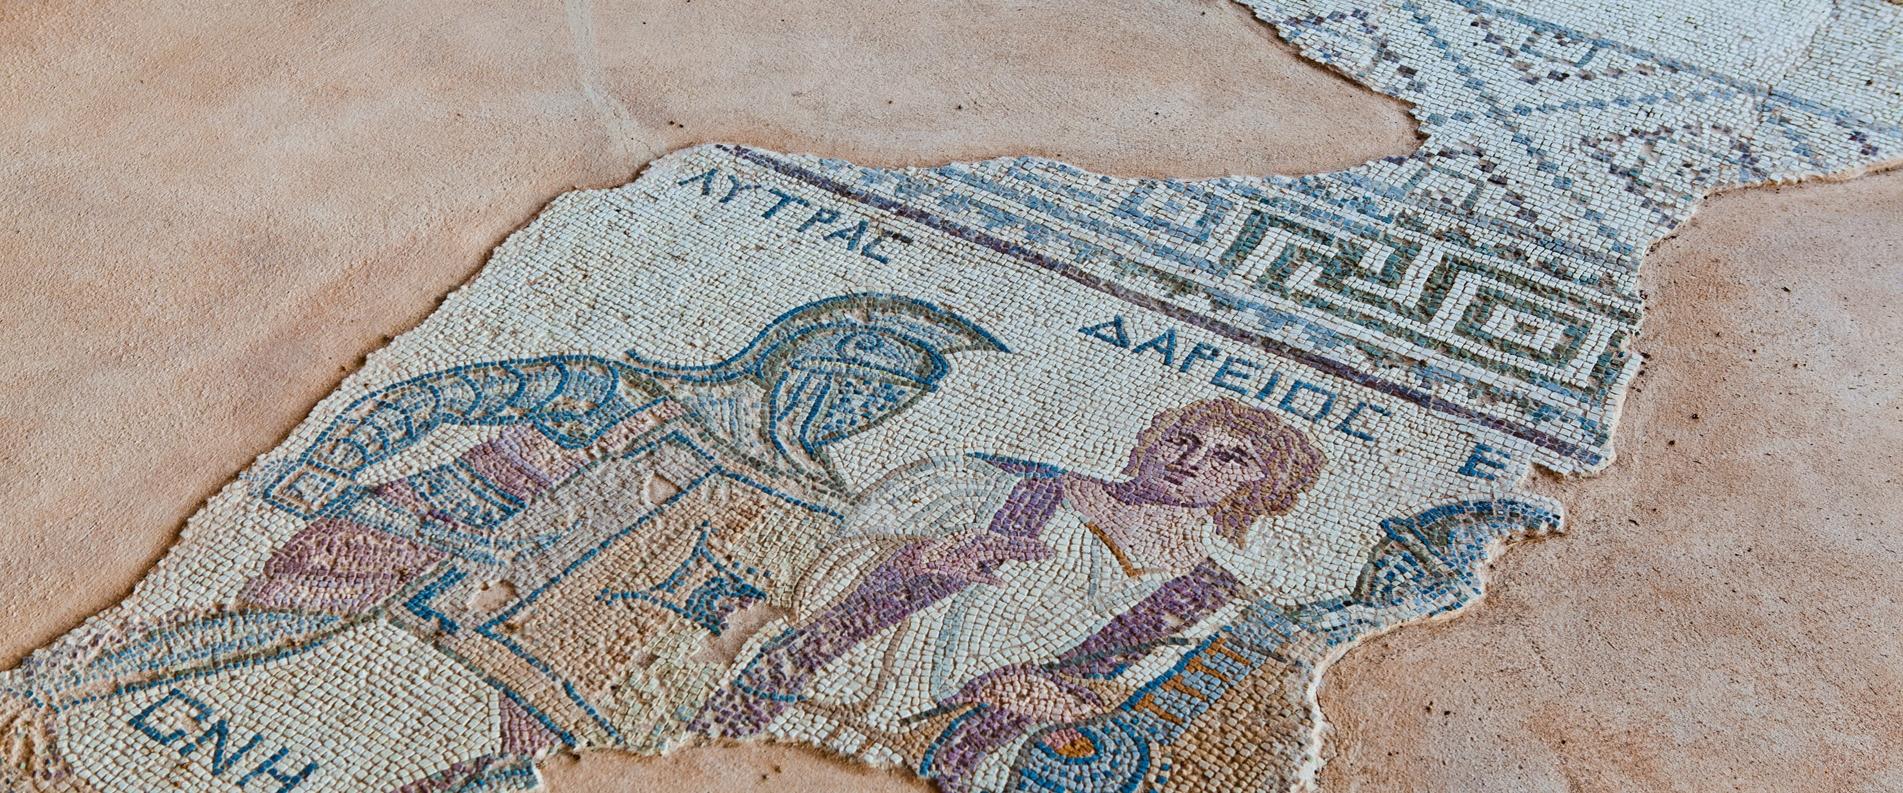 Мозаика на Кипре